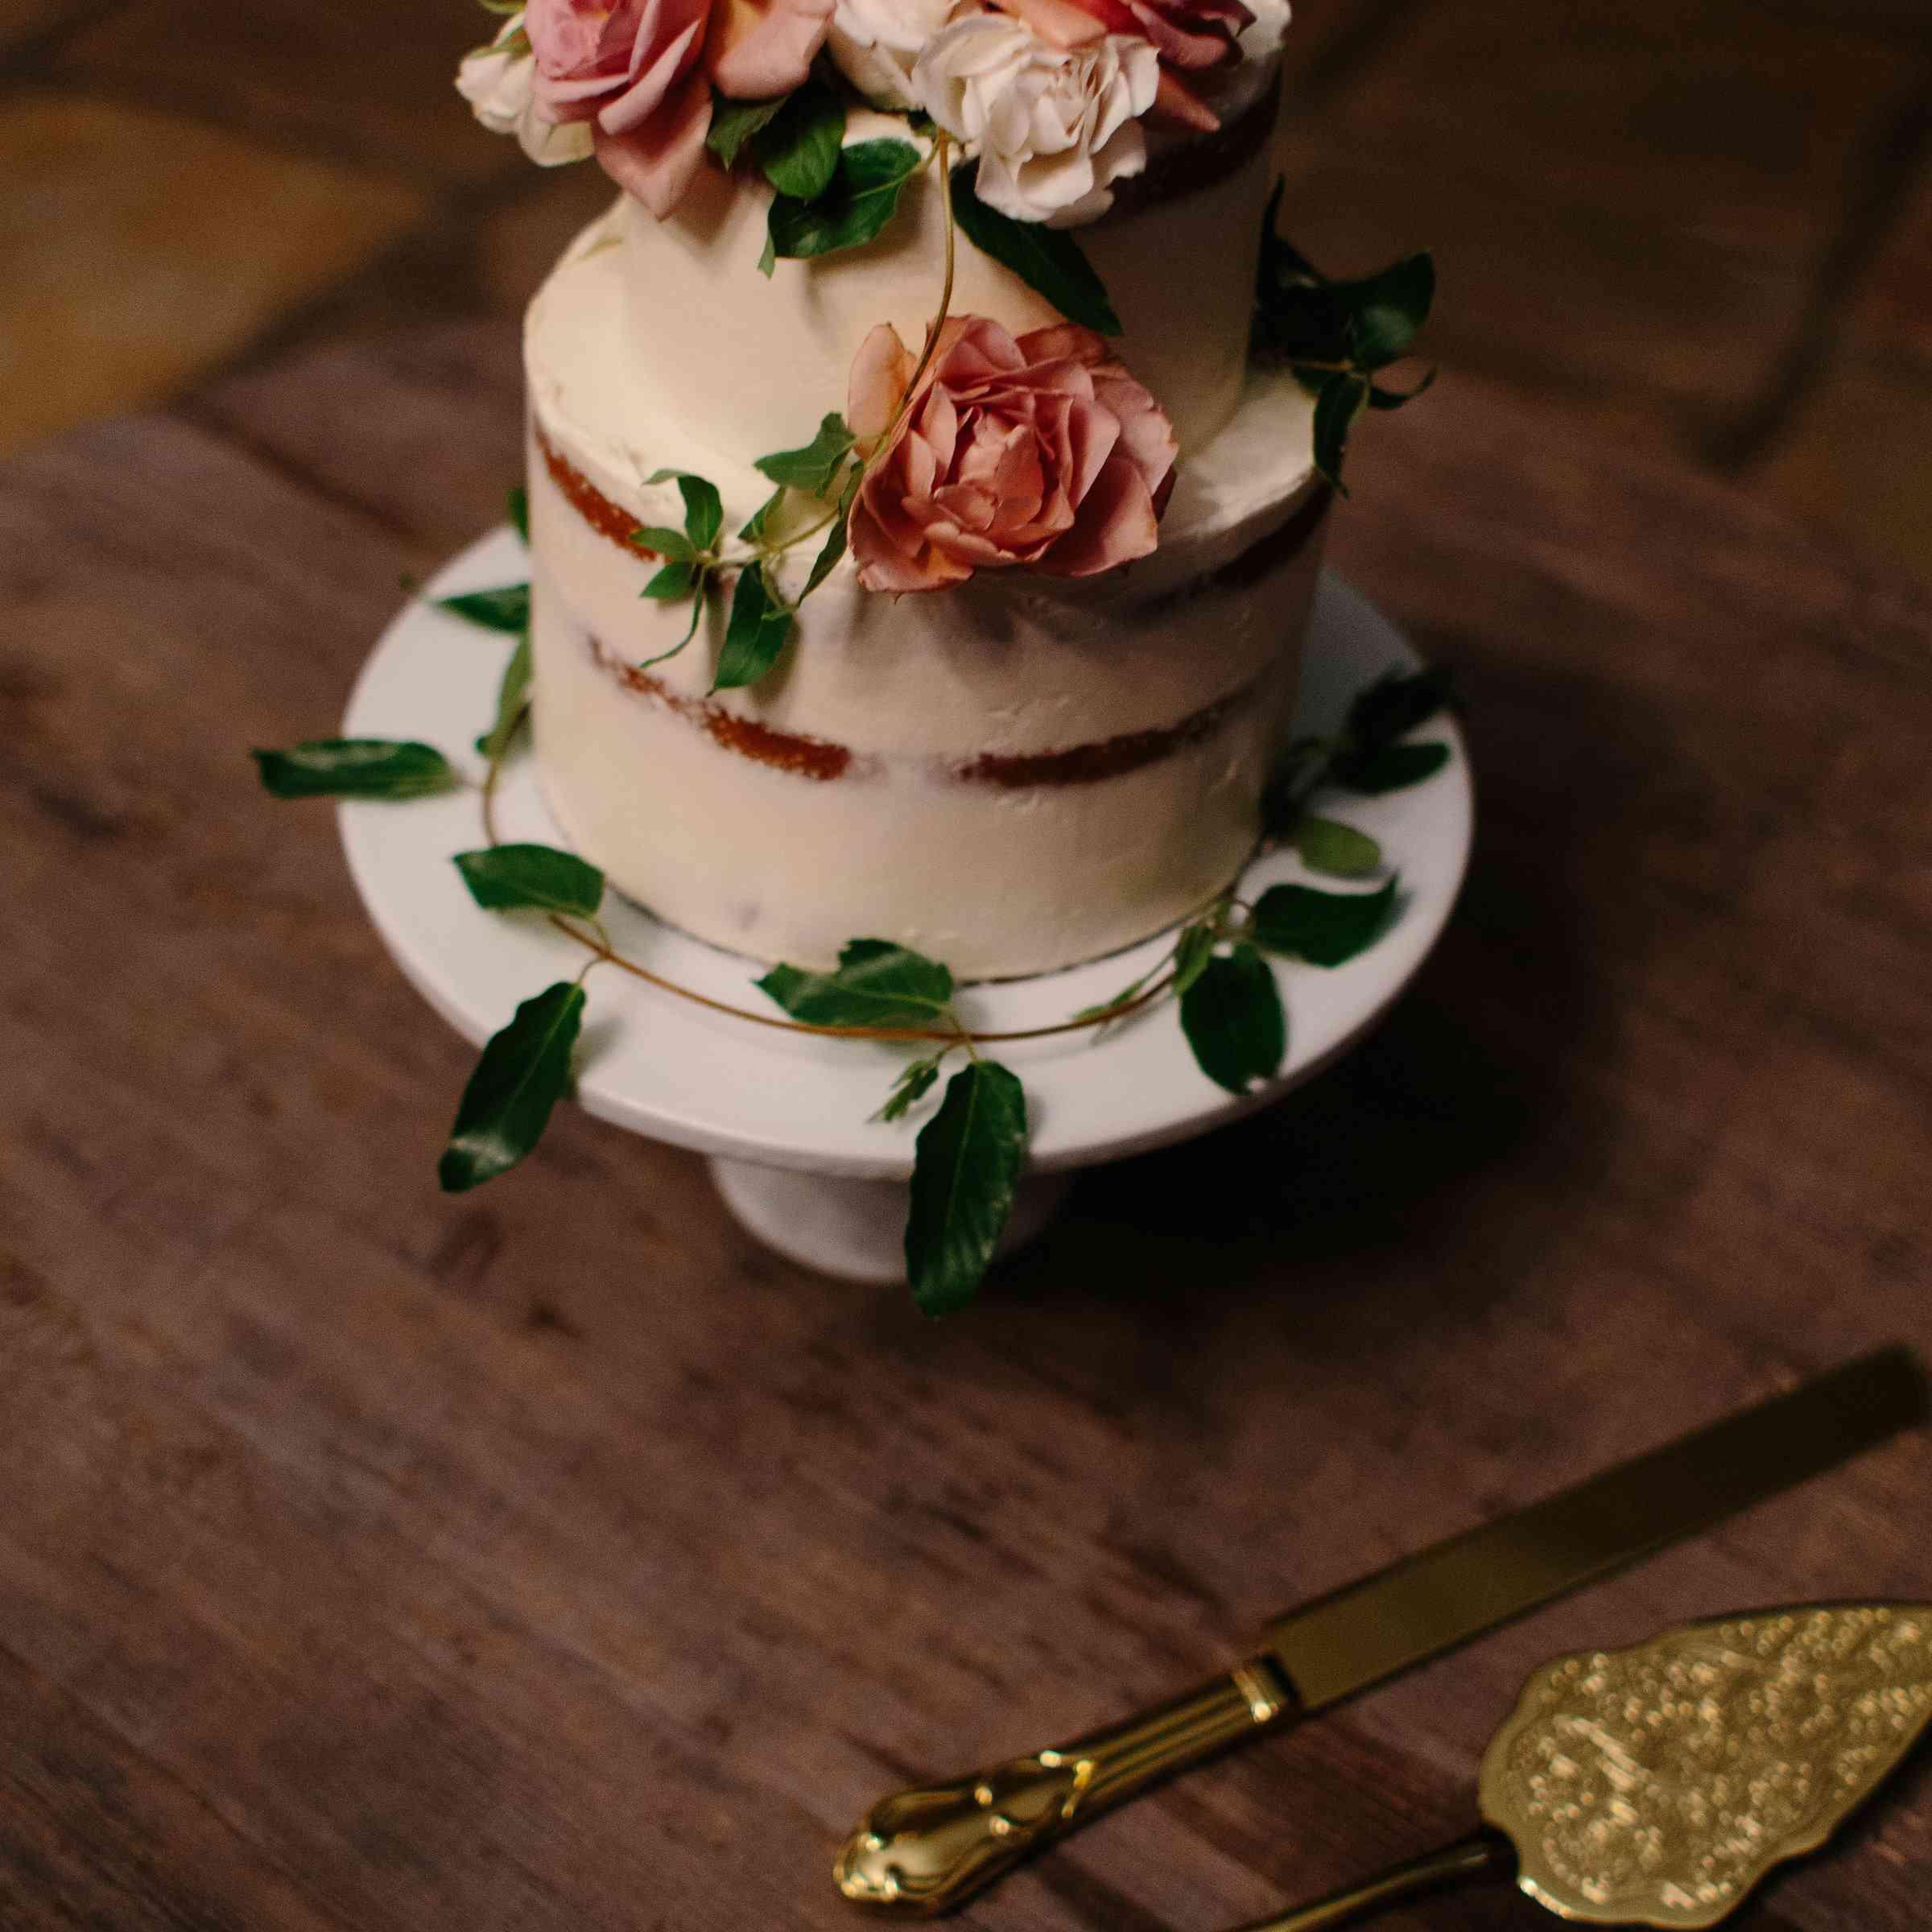 Tahitian vanilla wedding cake with bourbon caramel filling